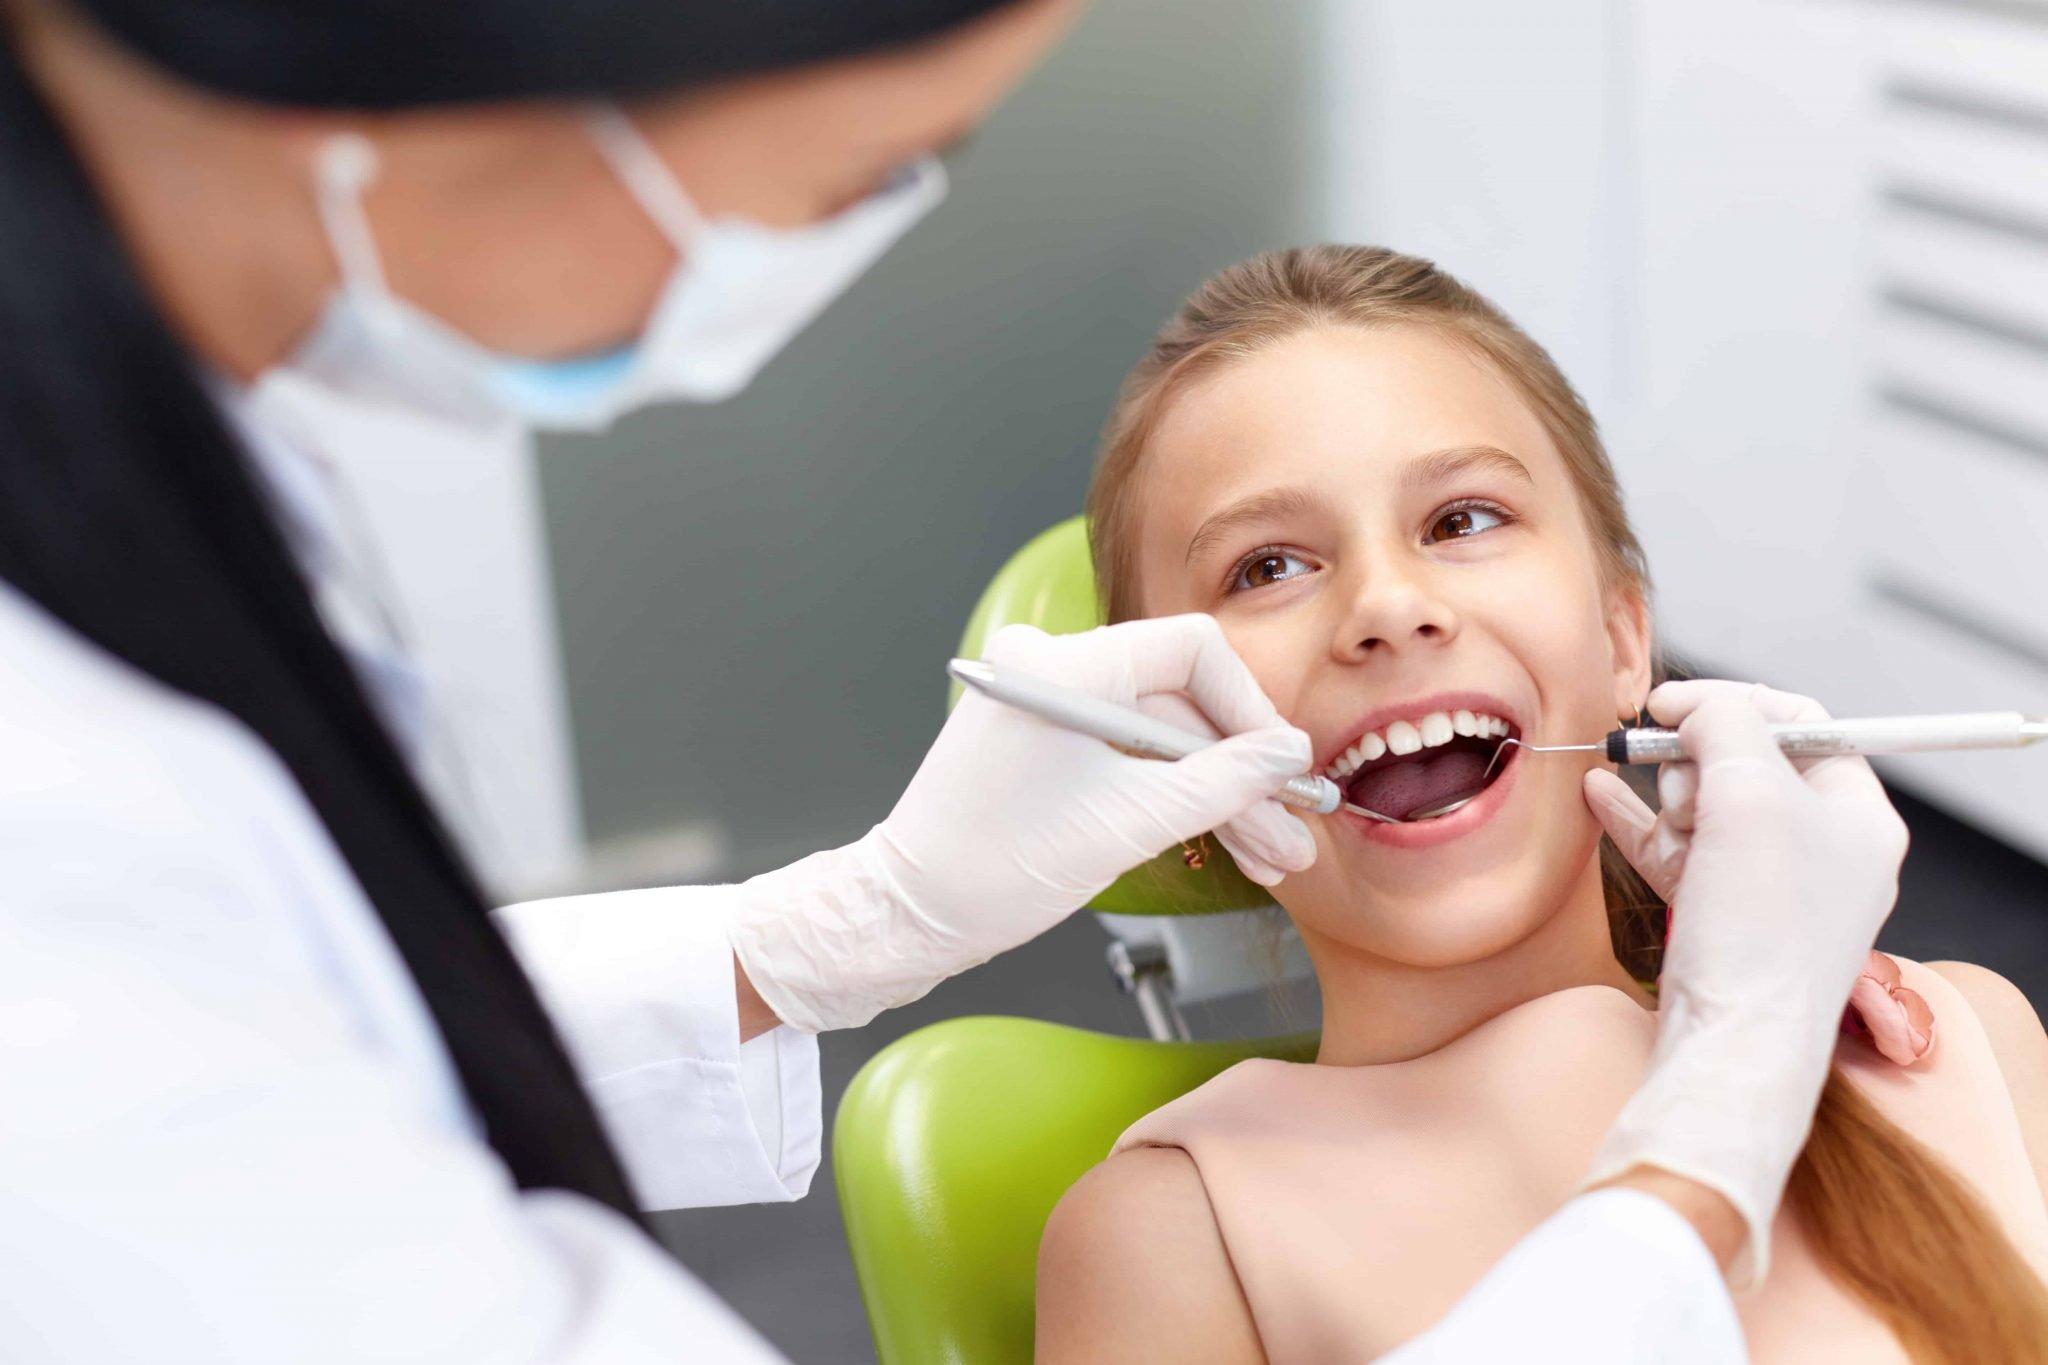 Dental examination Montreal